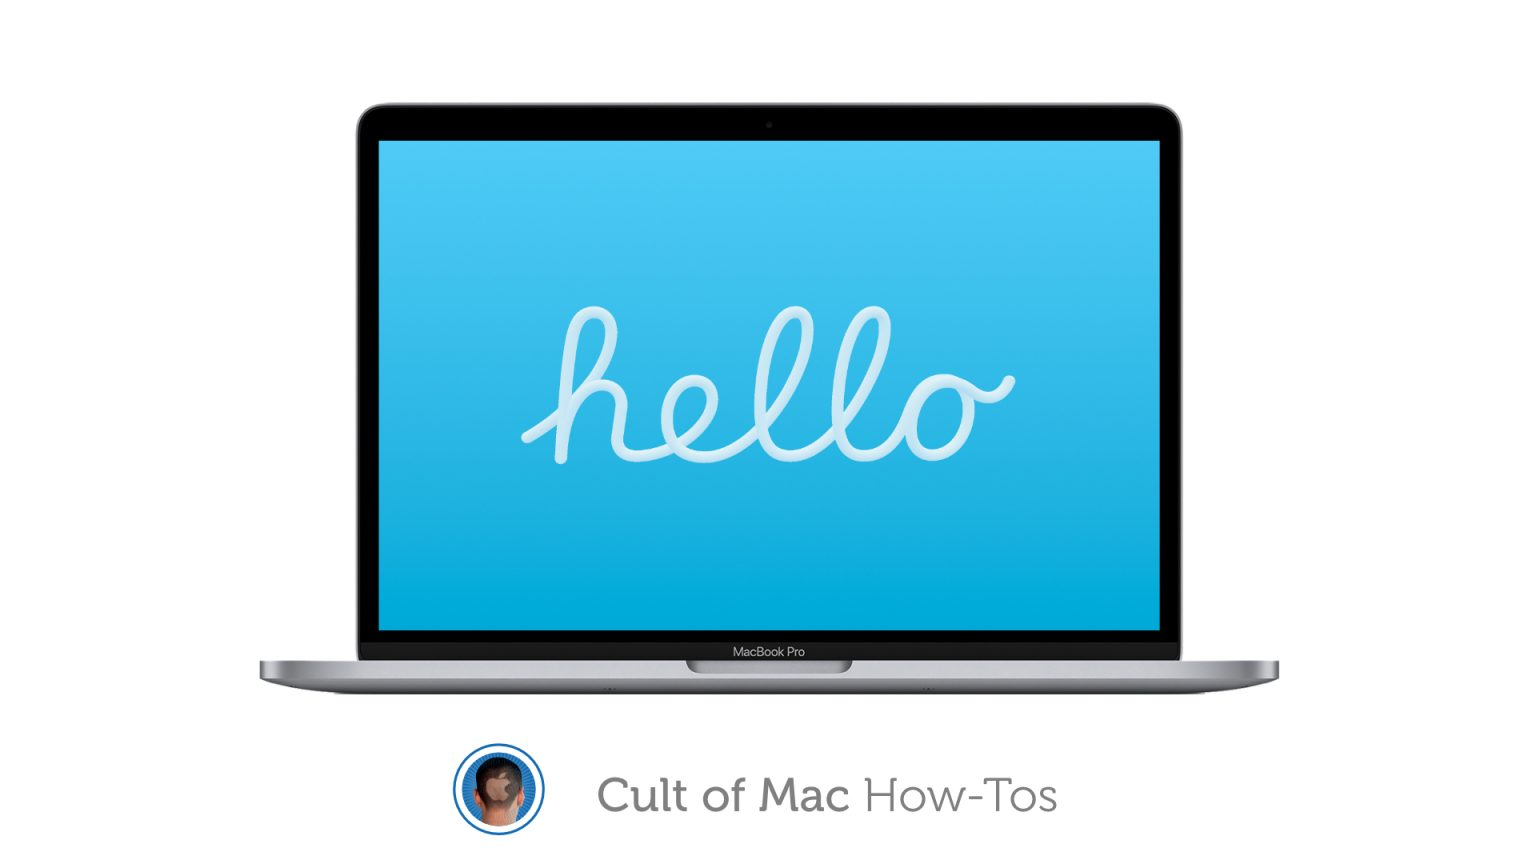 Enable M1 Mac's hello screen saver